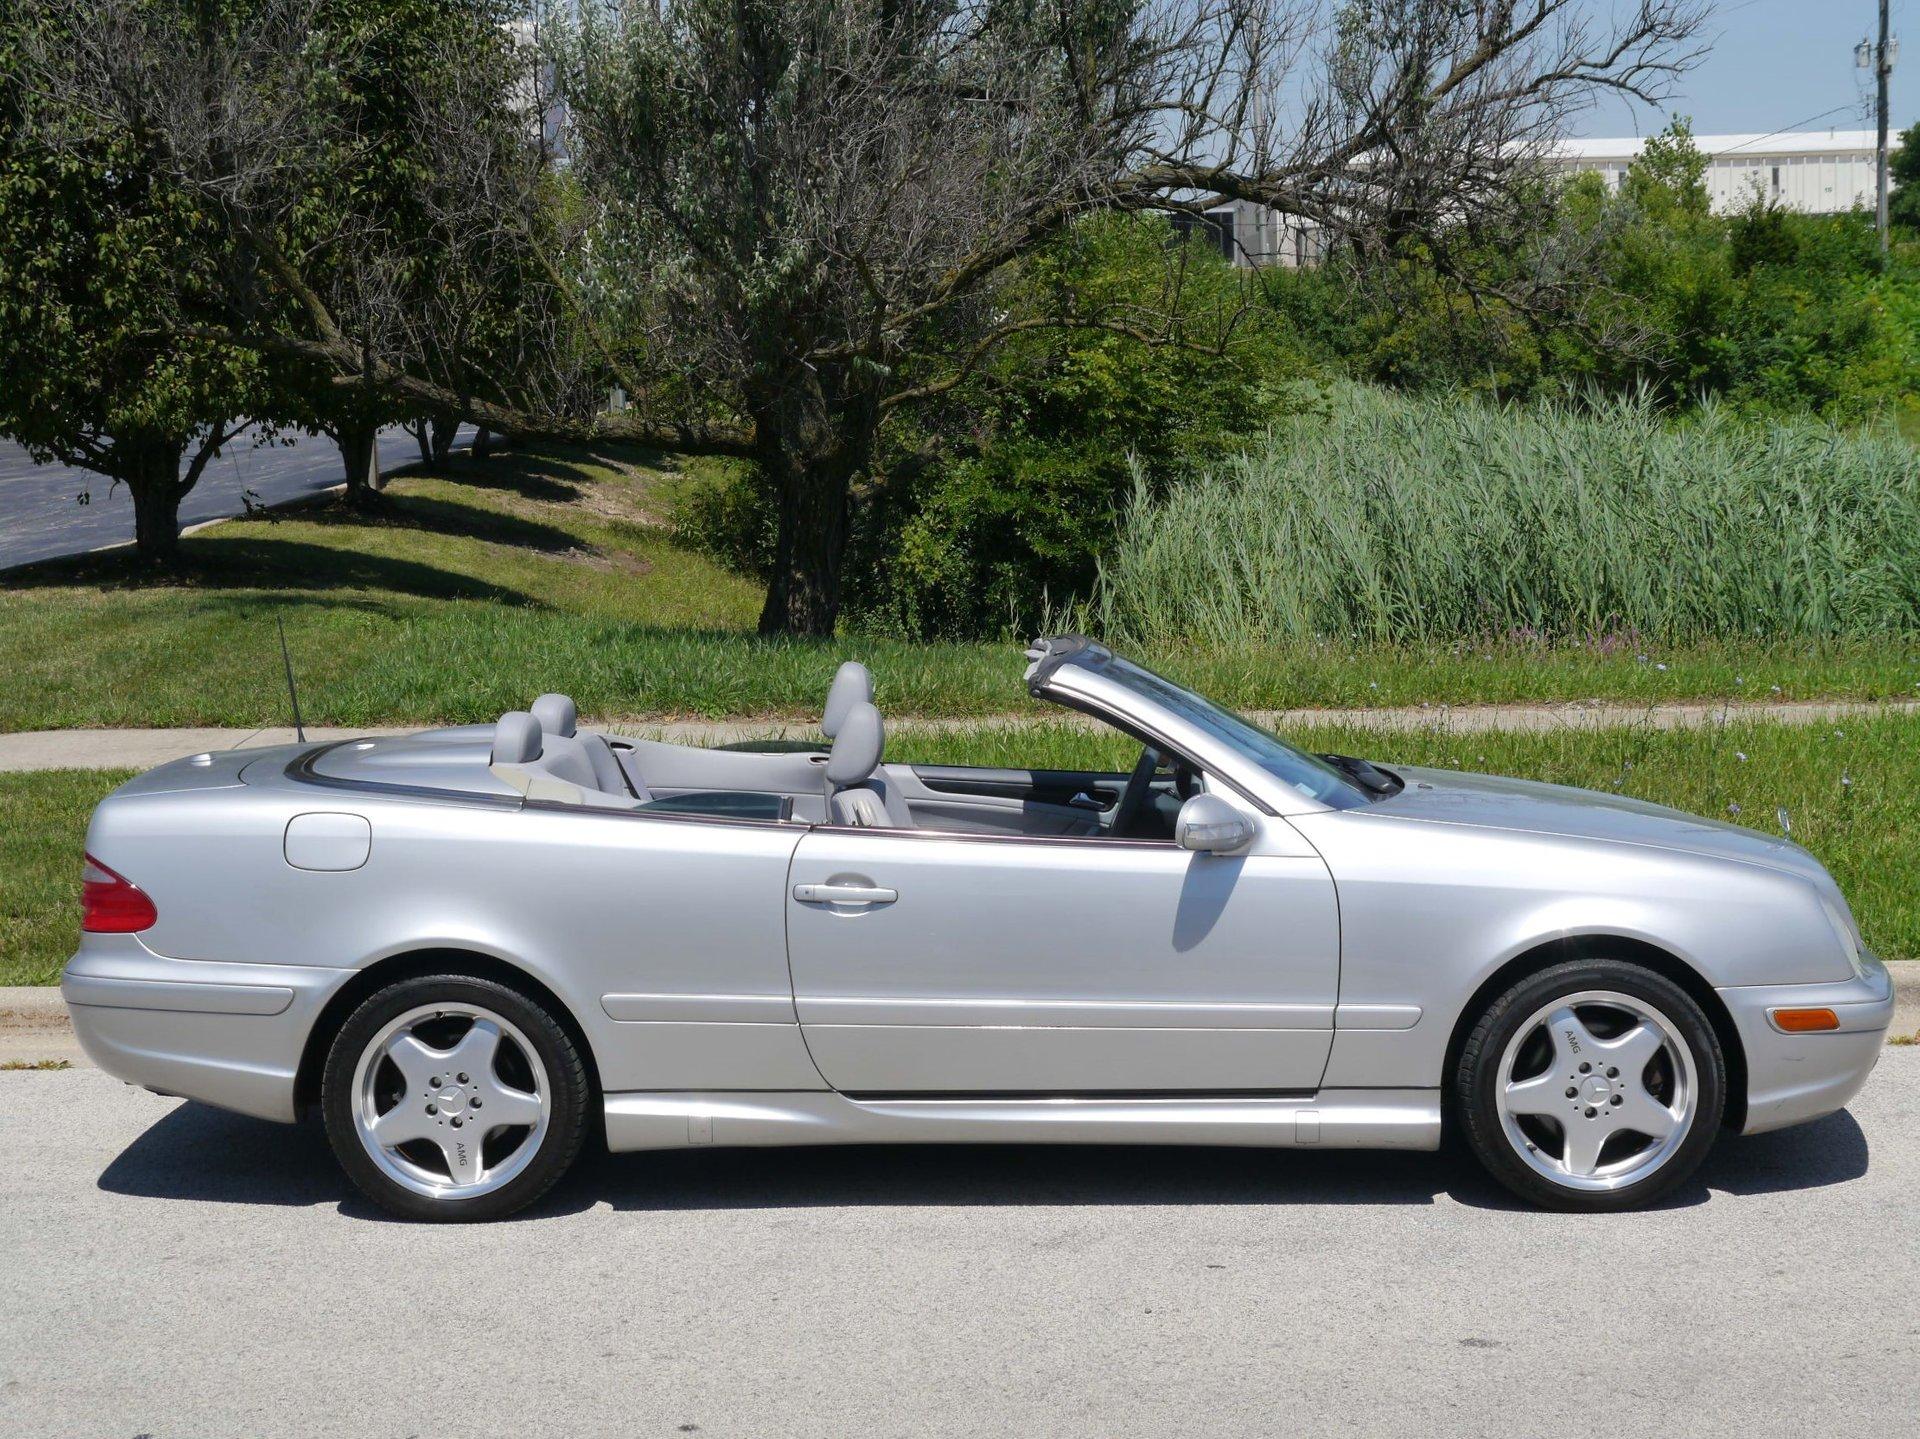 2001 Mercedes Benz CLK430 | Midwest Car Exchange